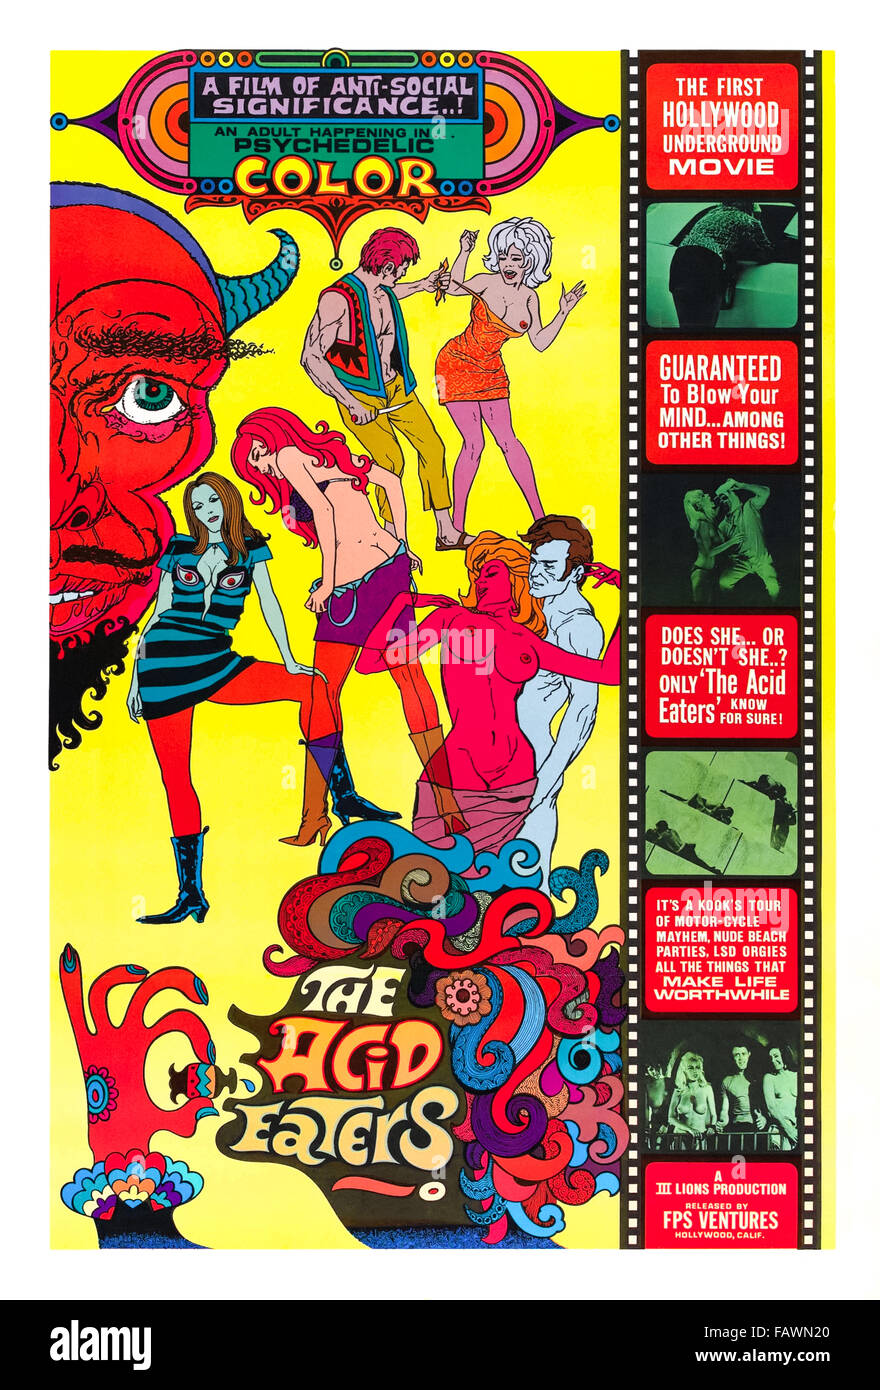 I mangiatori di acido Poster Immagini Stock